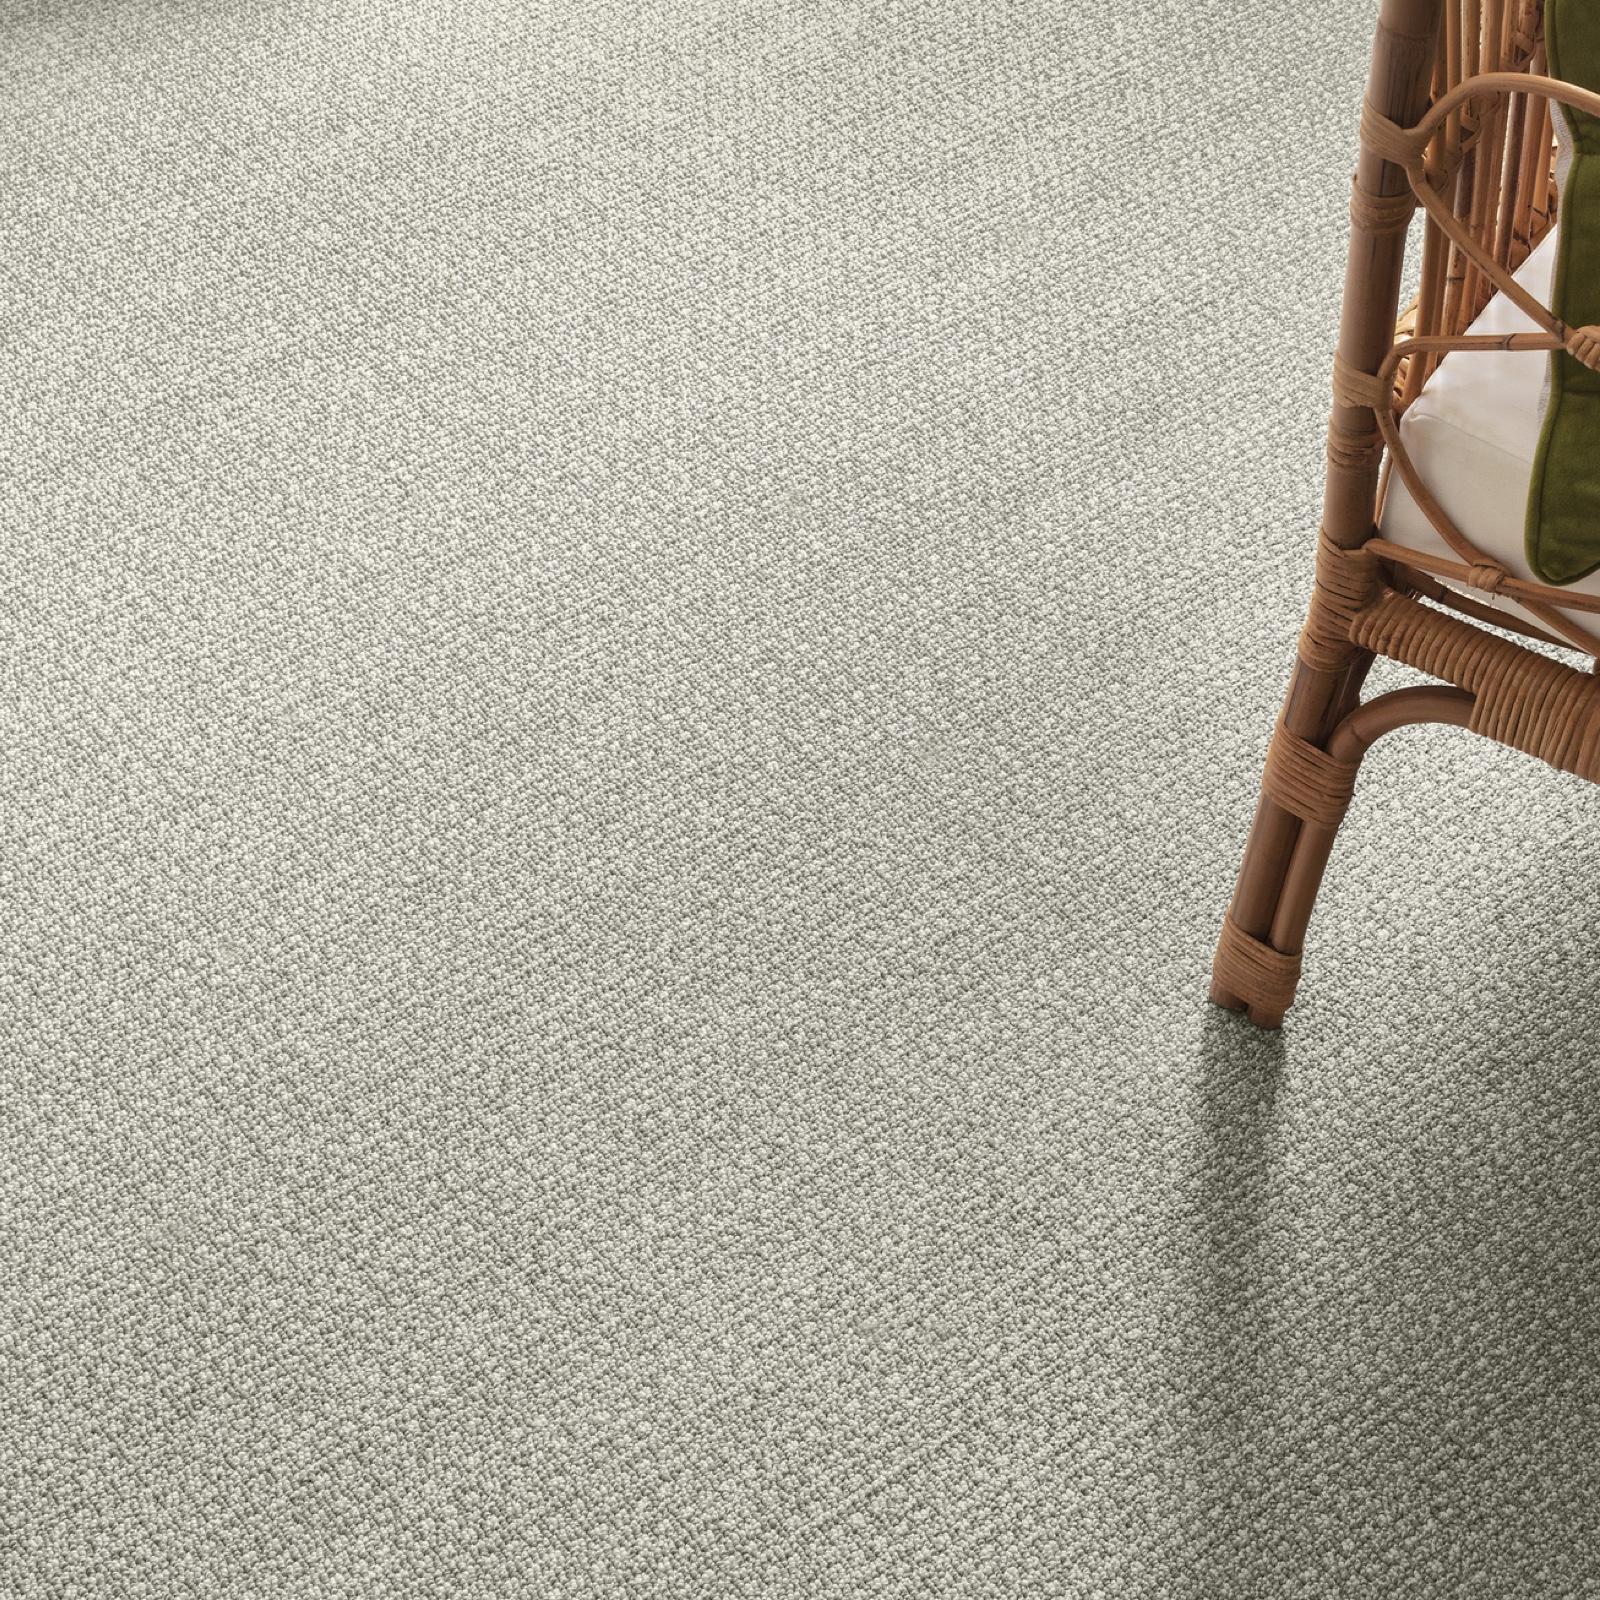 Carpet Fetch 712 Briarwood O 6710, Paneling Factory Of Virginia